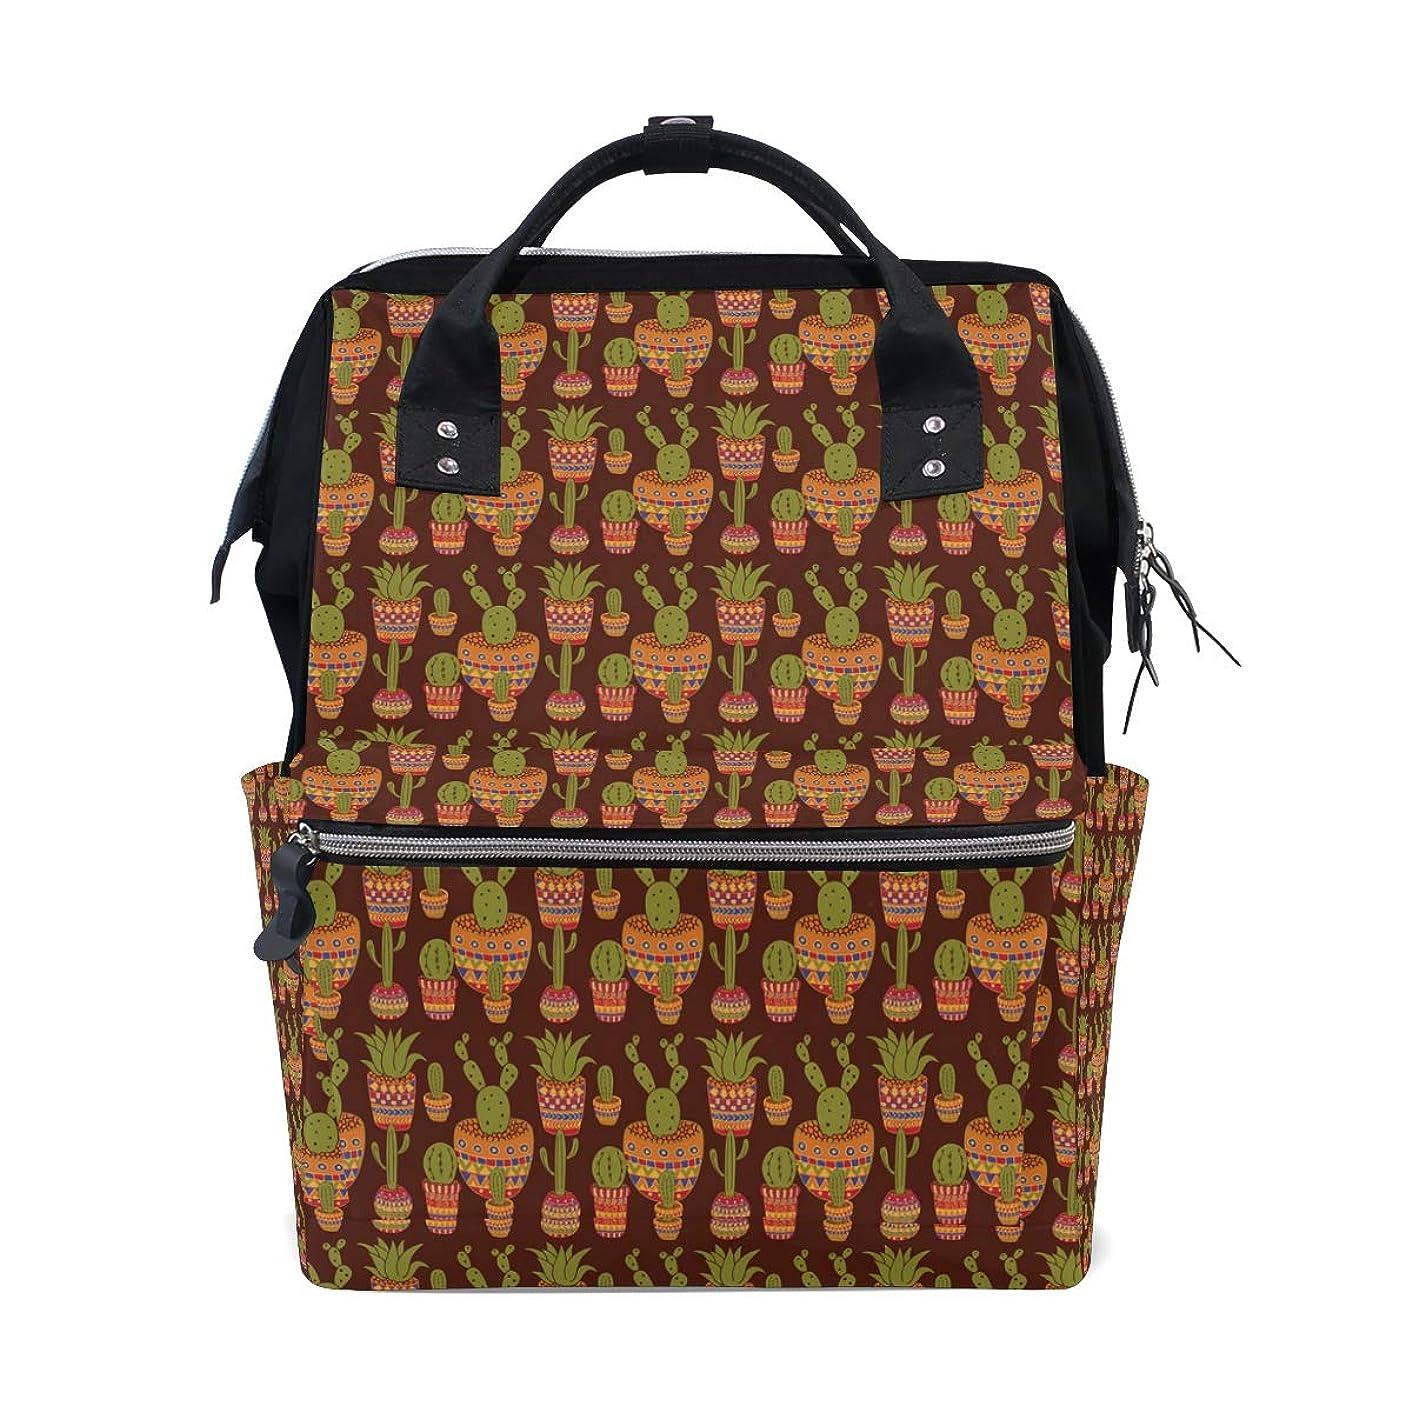 Backpack Indian Tribes Cactus Pot School Rucksack Diaper Bags Travel Shoulder Large Capacity Bookbag for Women Men